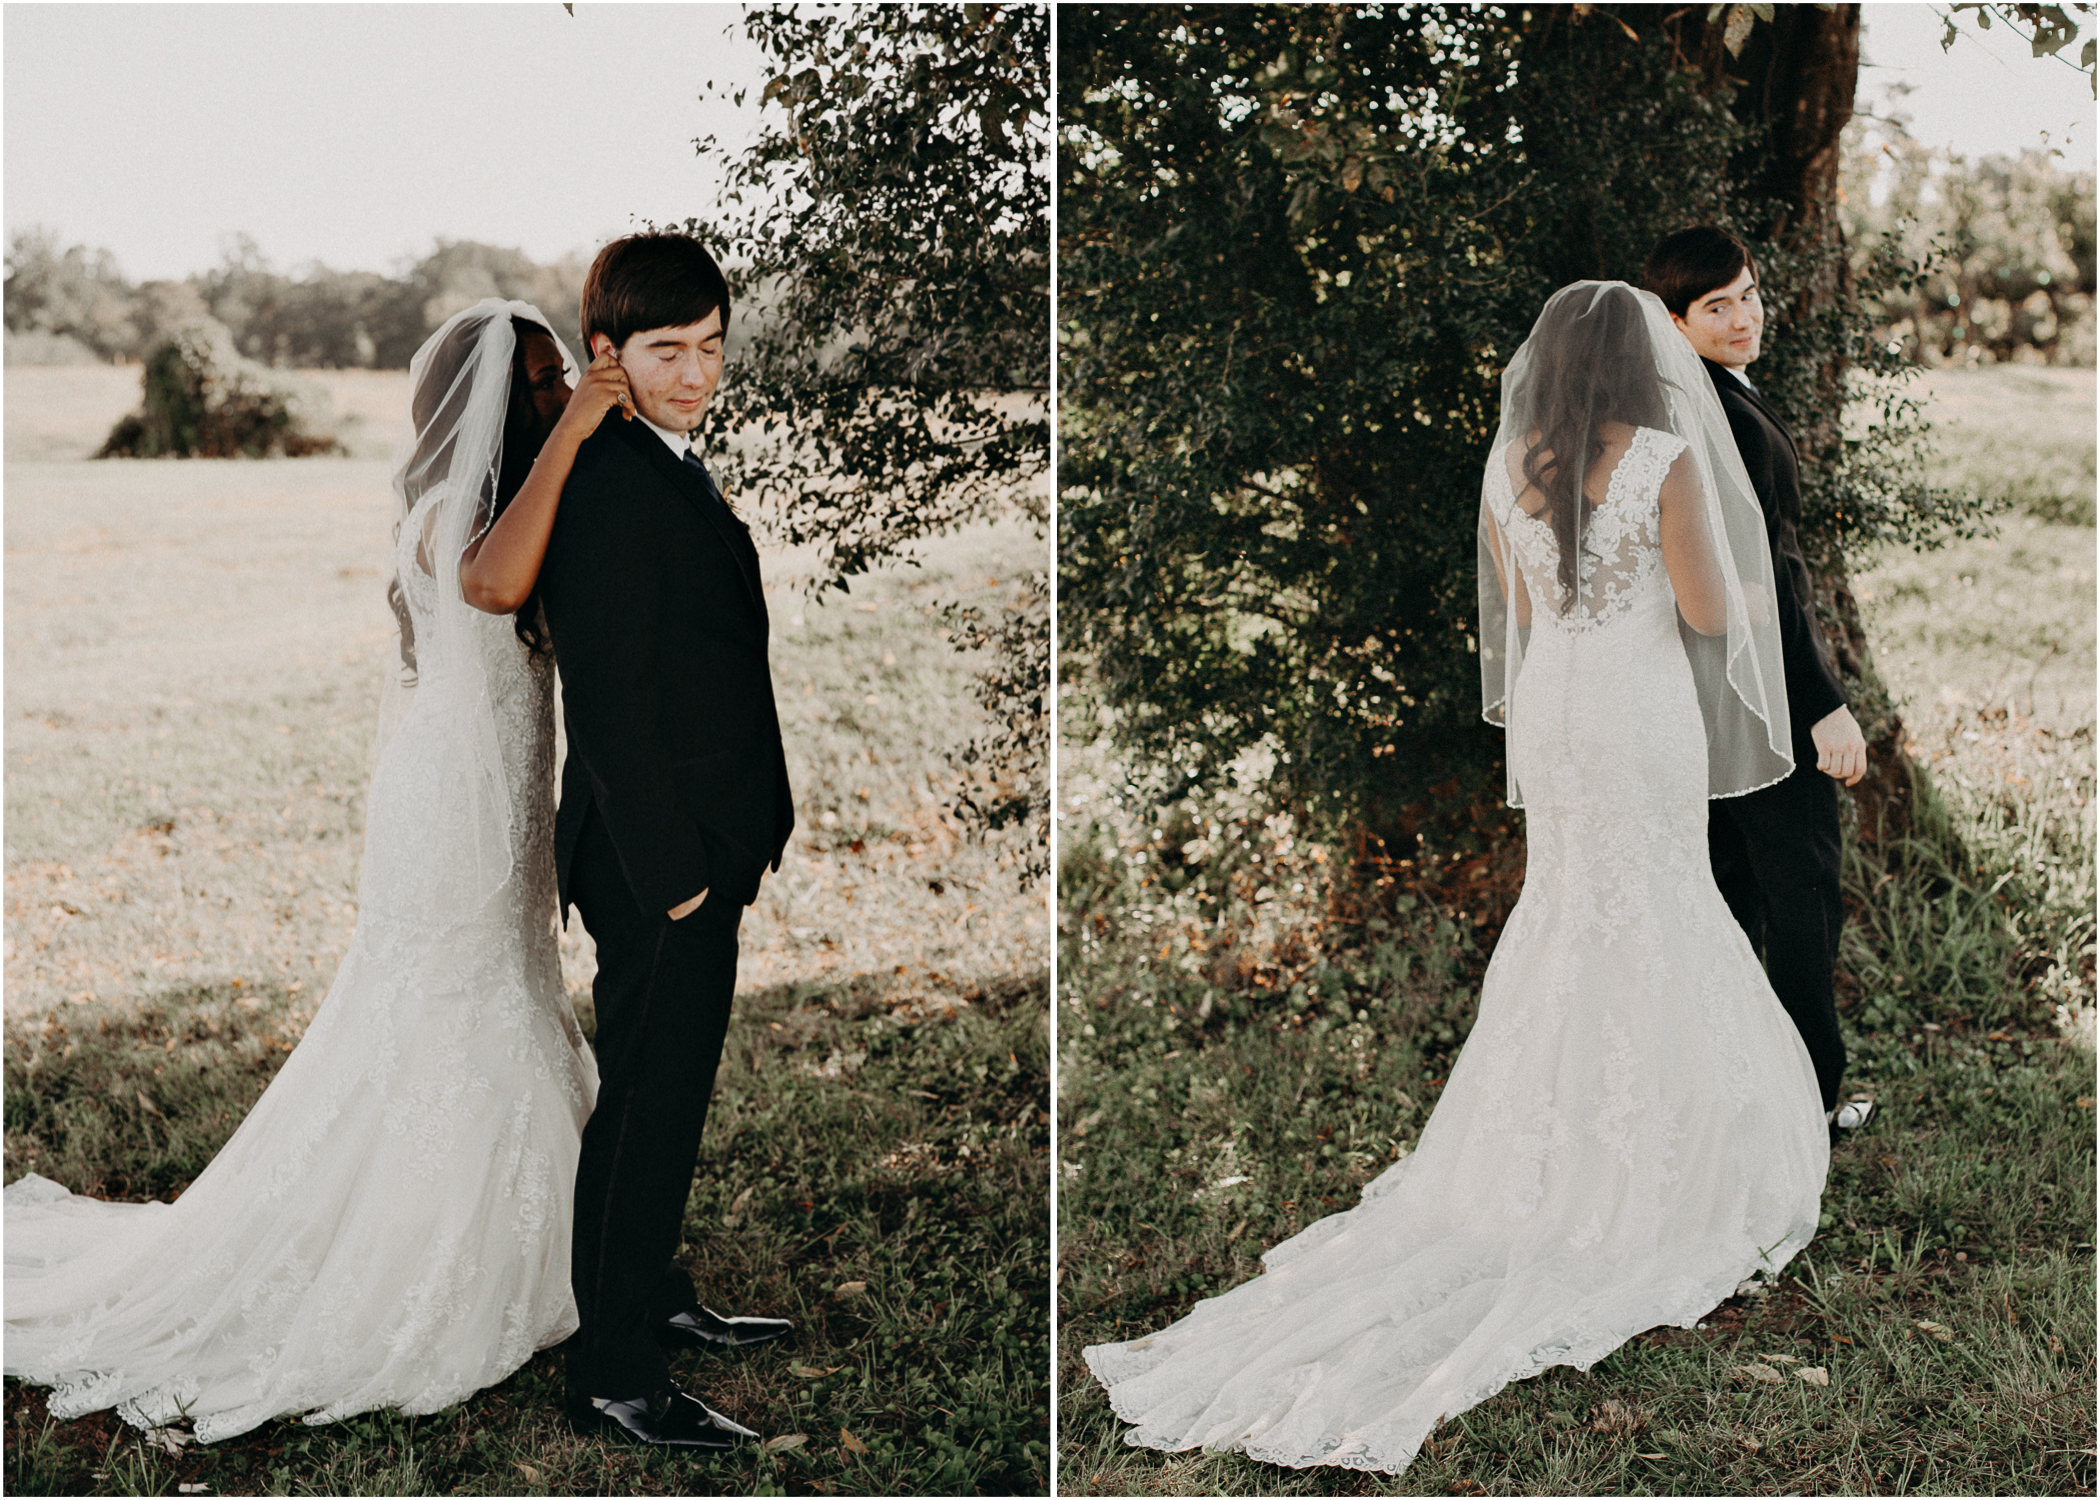 32- Wedding_day_atlanta_georgia_Bride_and_groom_first_look_and_portraits_aline_marin_photography.jpg